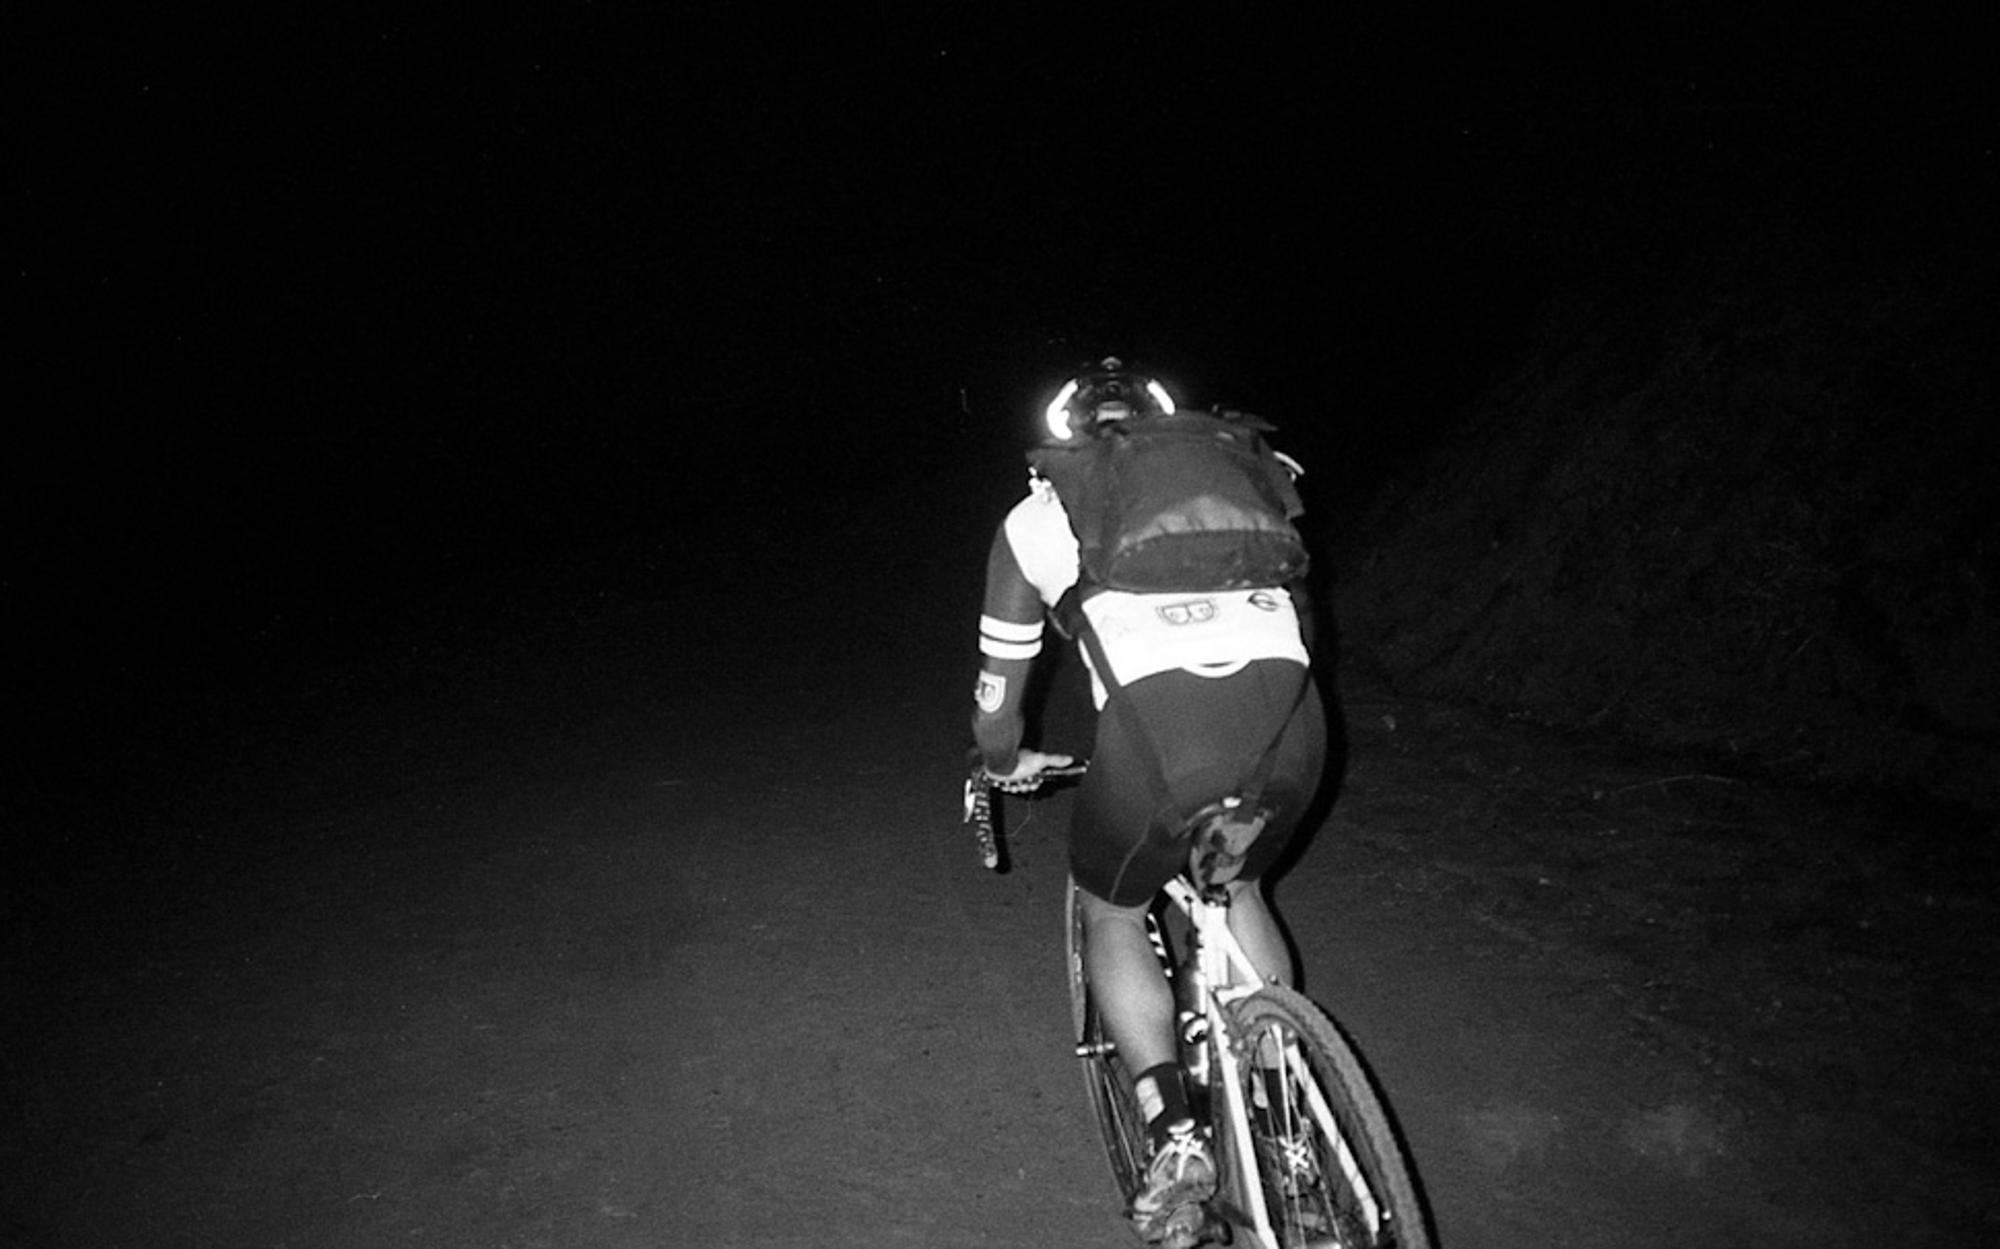 Recent Roll: LA Night Ride